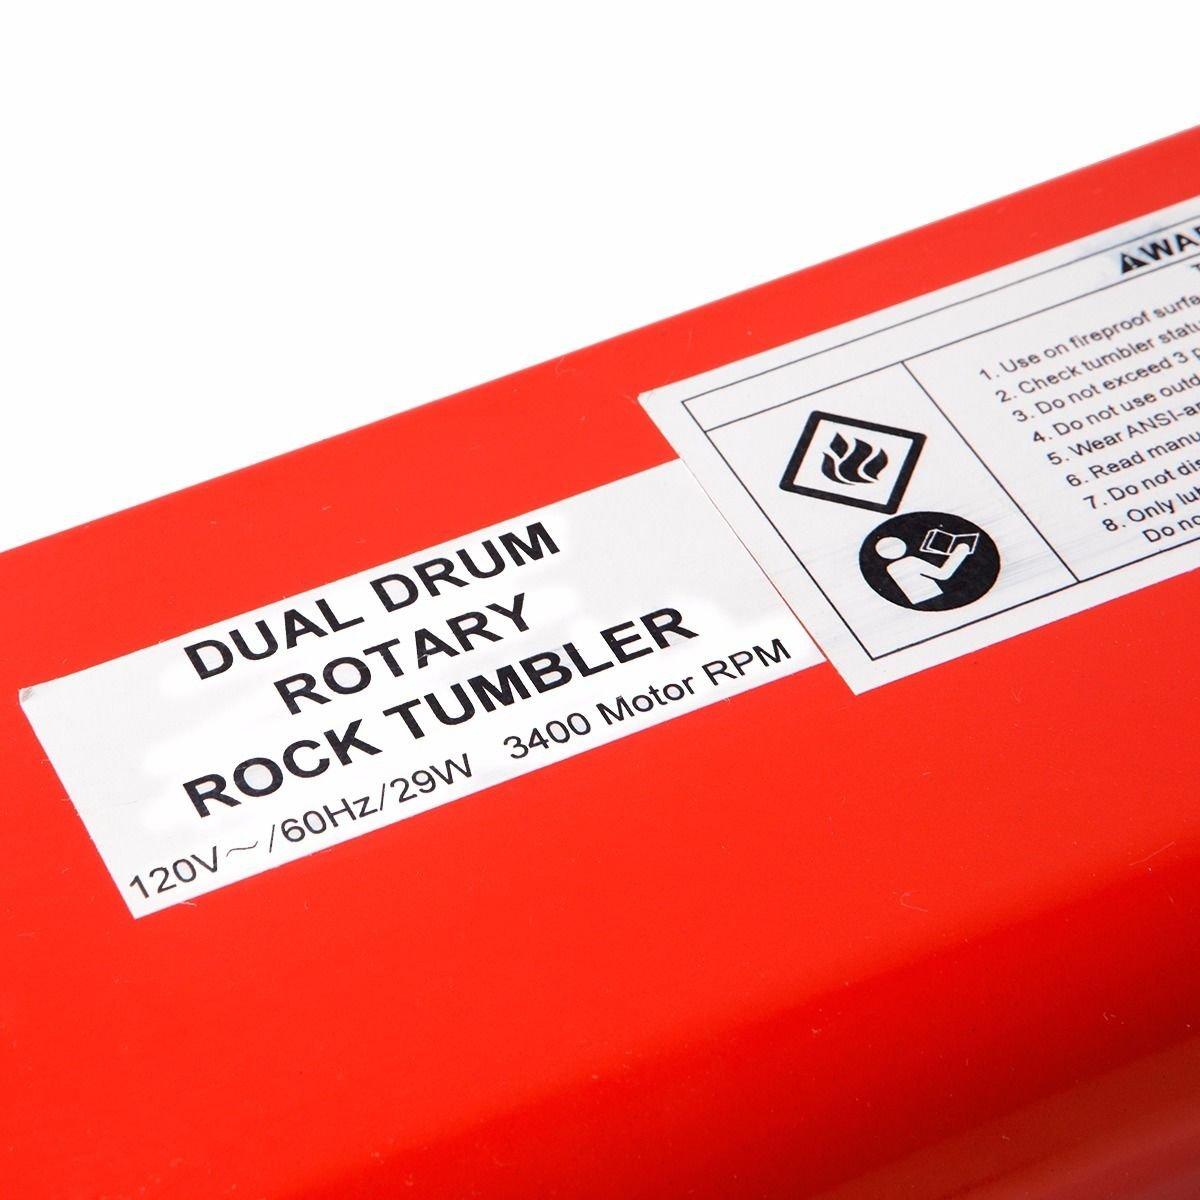 Dual Drum 2 Drum Rotary Rock Stone Metal Tumbler Polisher 6 lb polishing jeweler by Favorite-trade (Image #8)